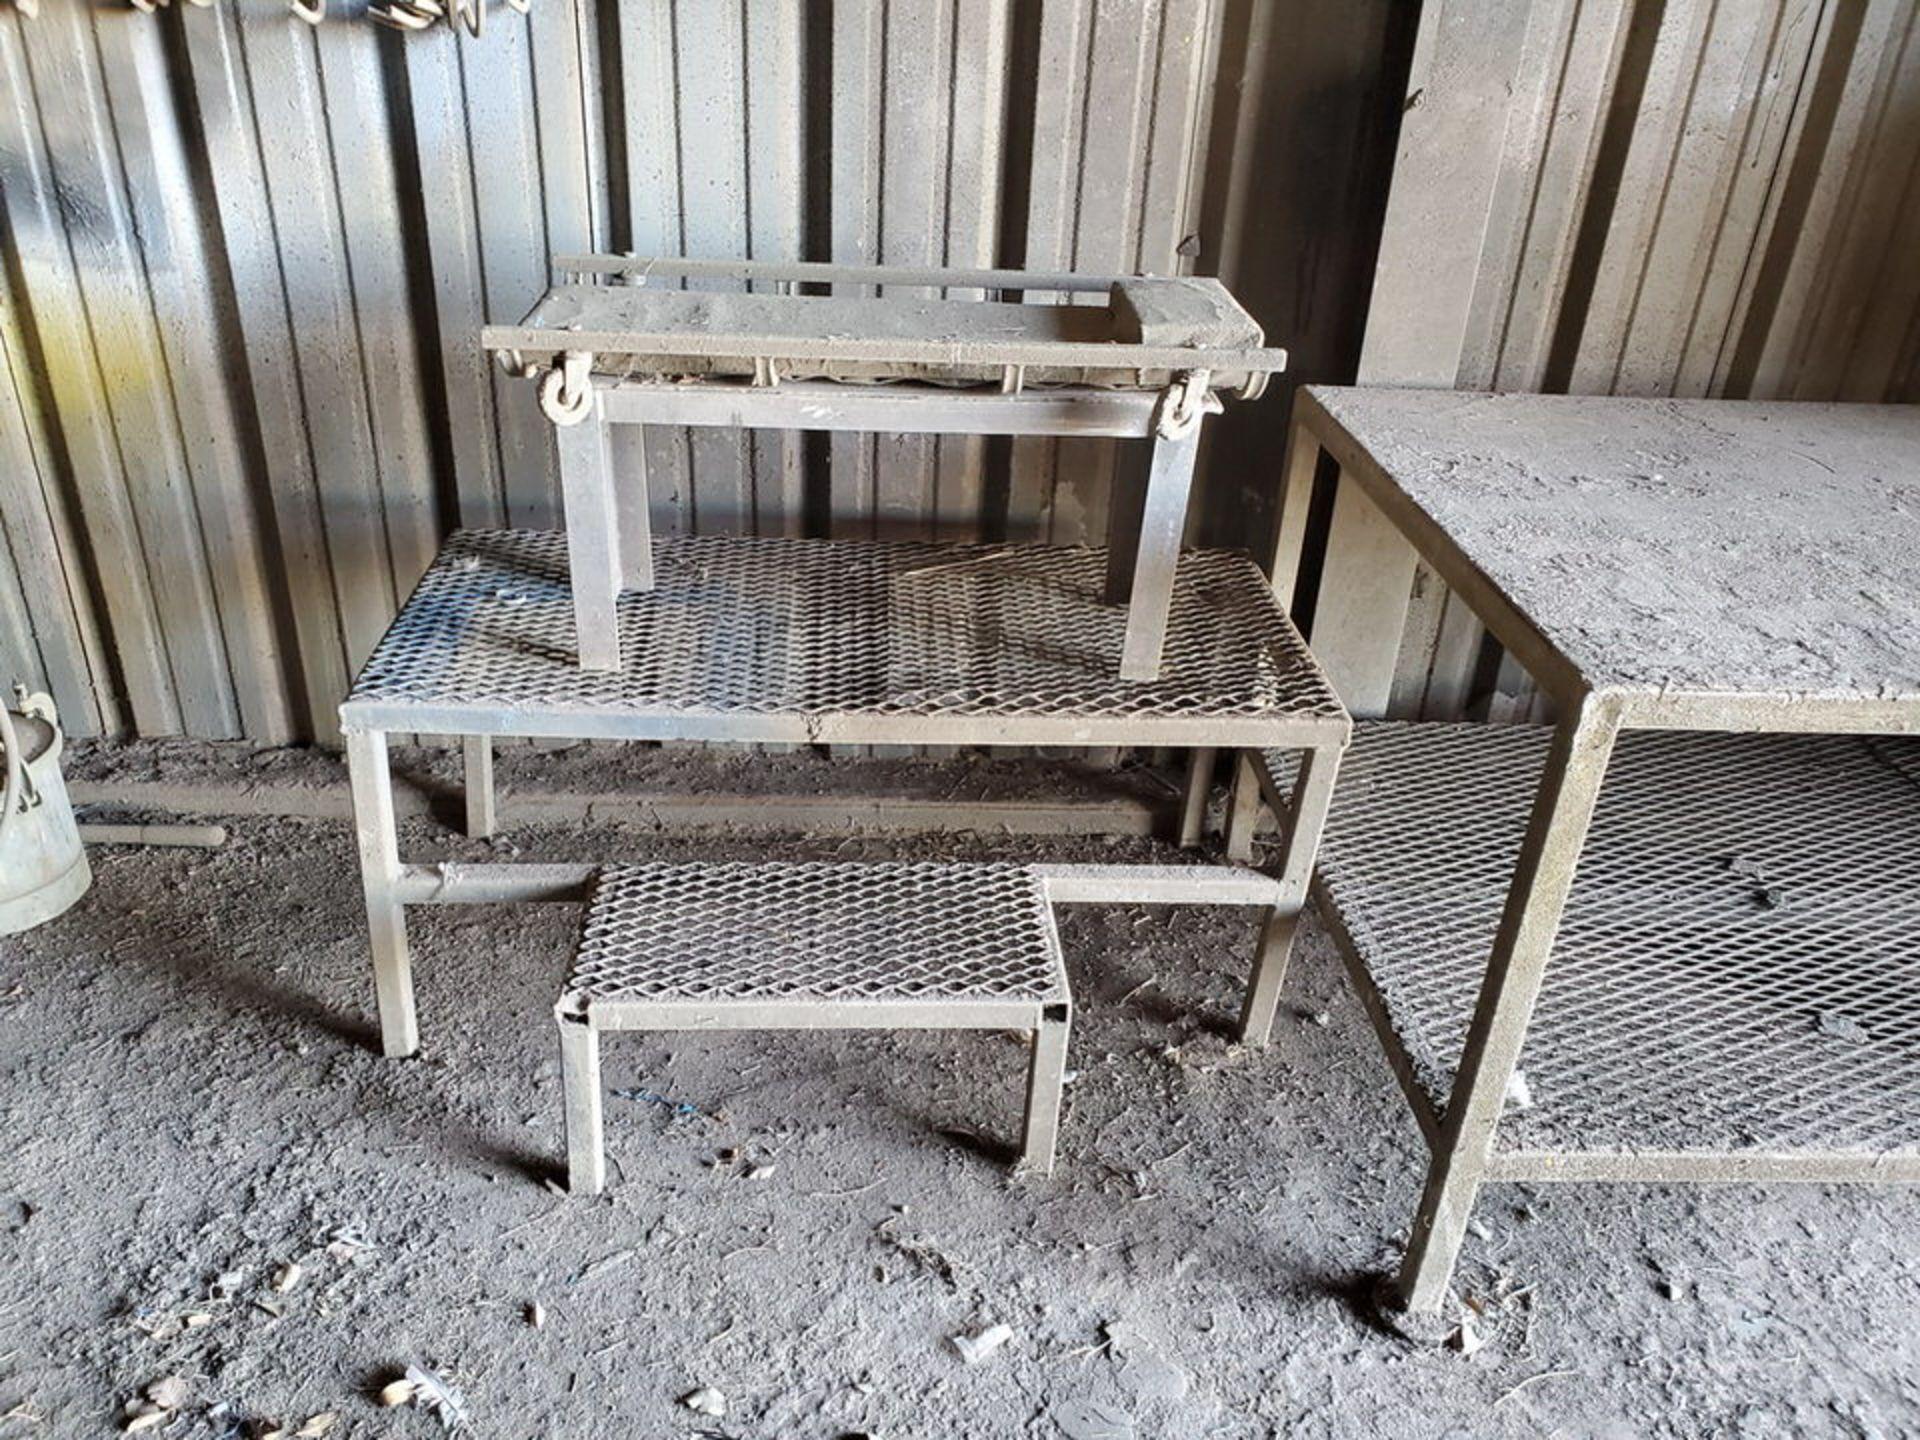 "Table & Platforms Size Range: 12"" x 30"" x 14"" - 40"" x 72"" x 33""; W/ Creeper Seat - Image 3 of 5"